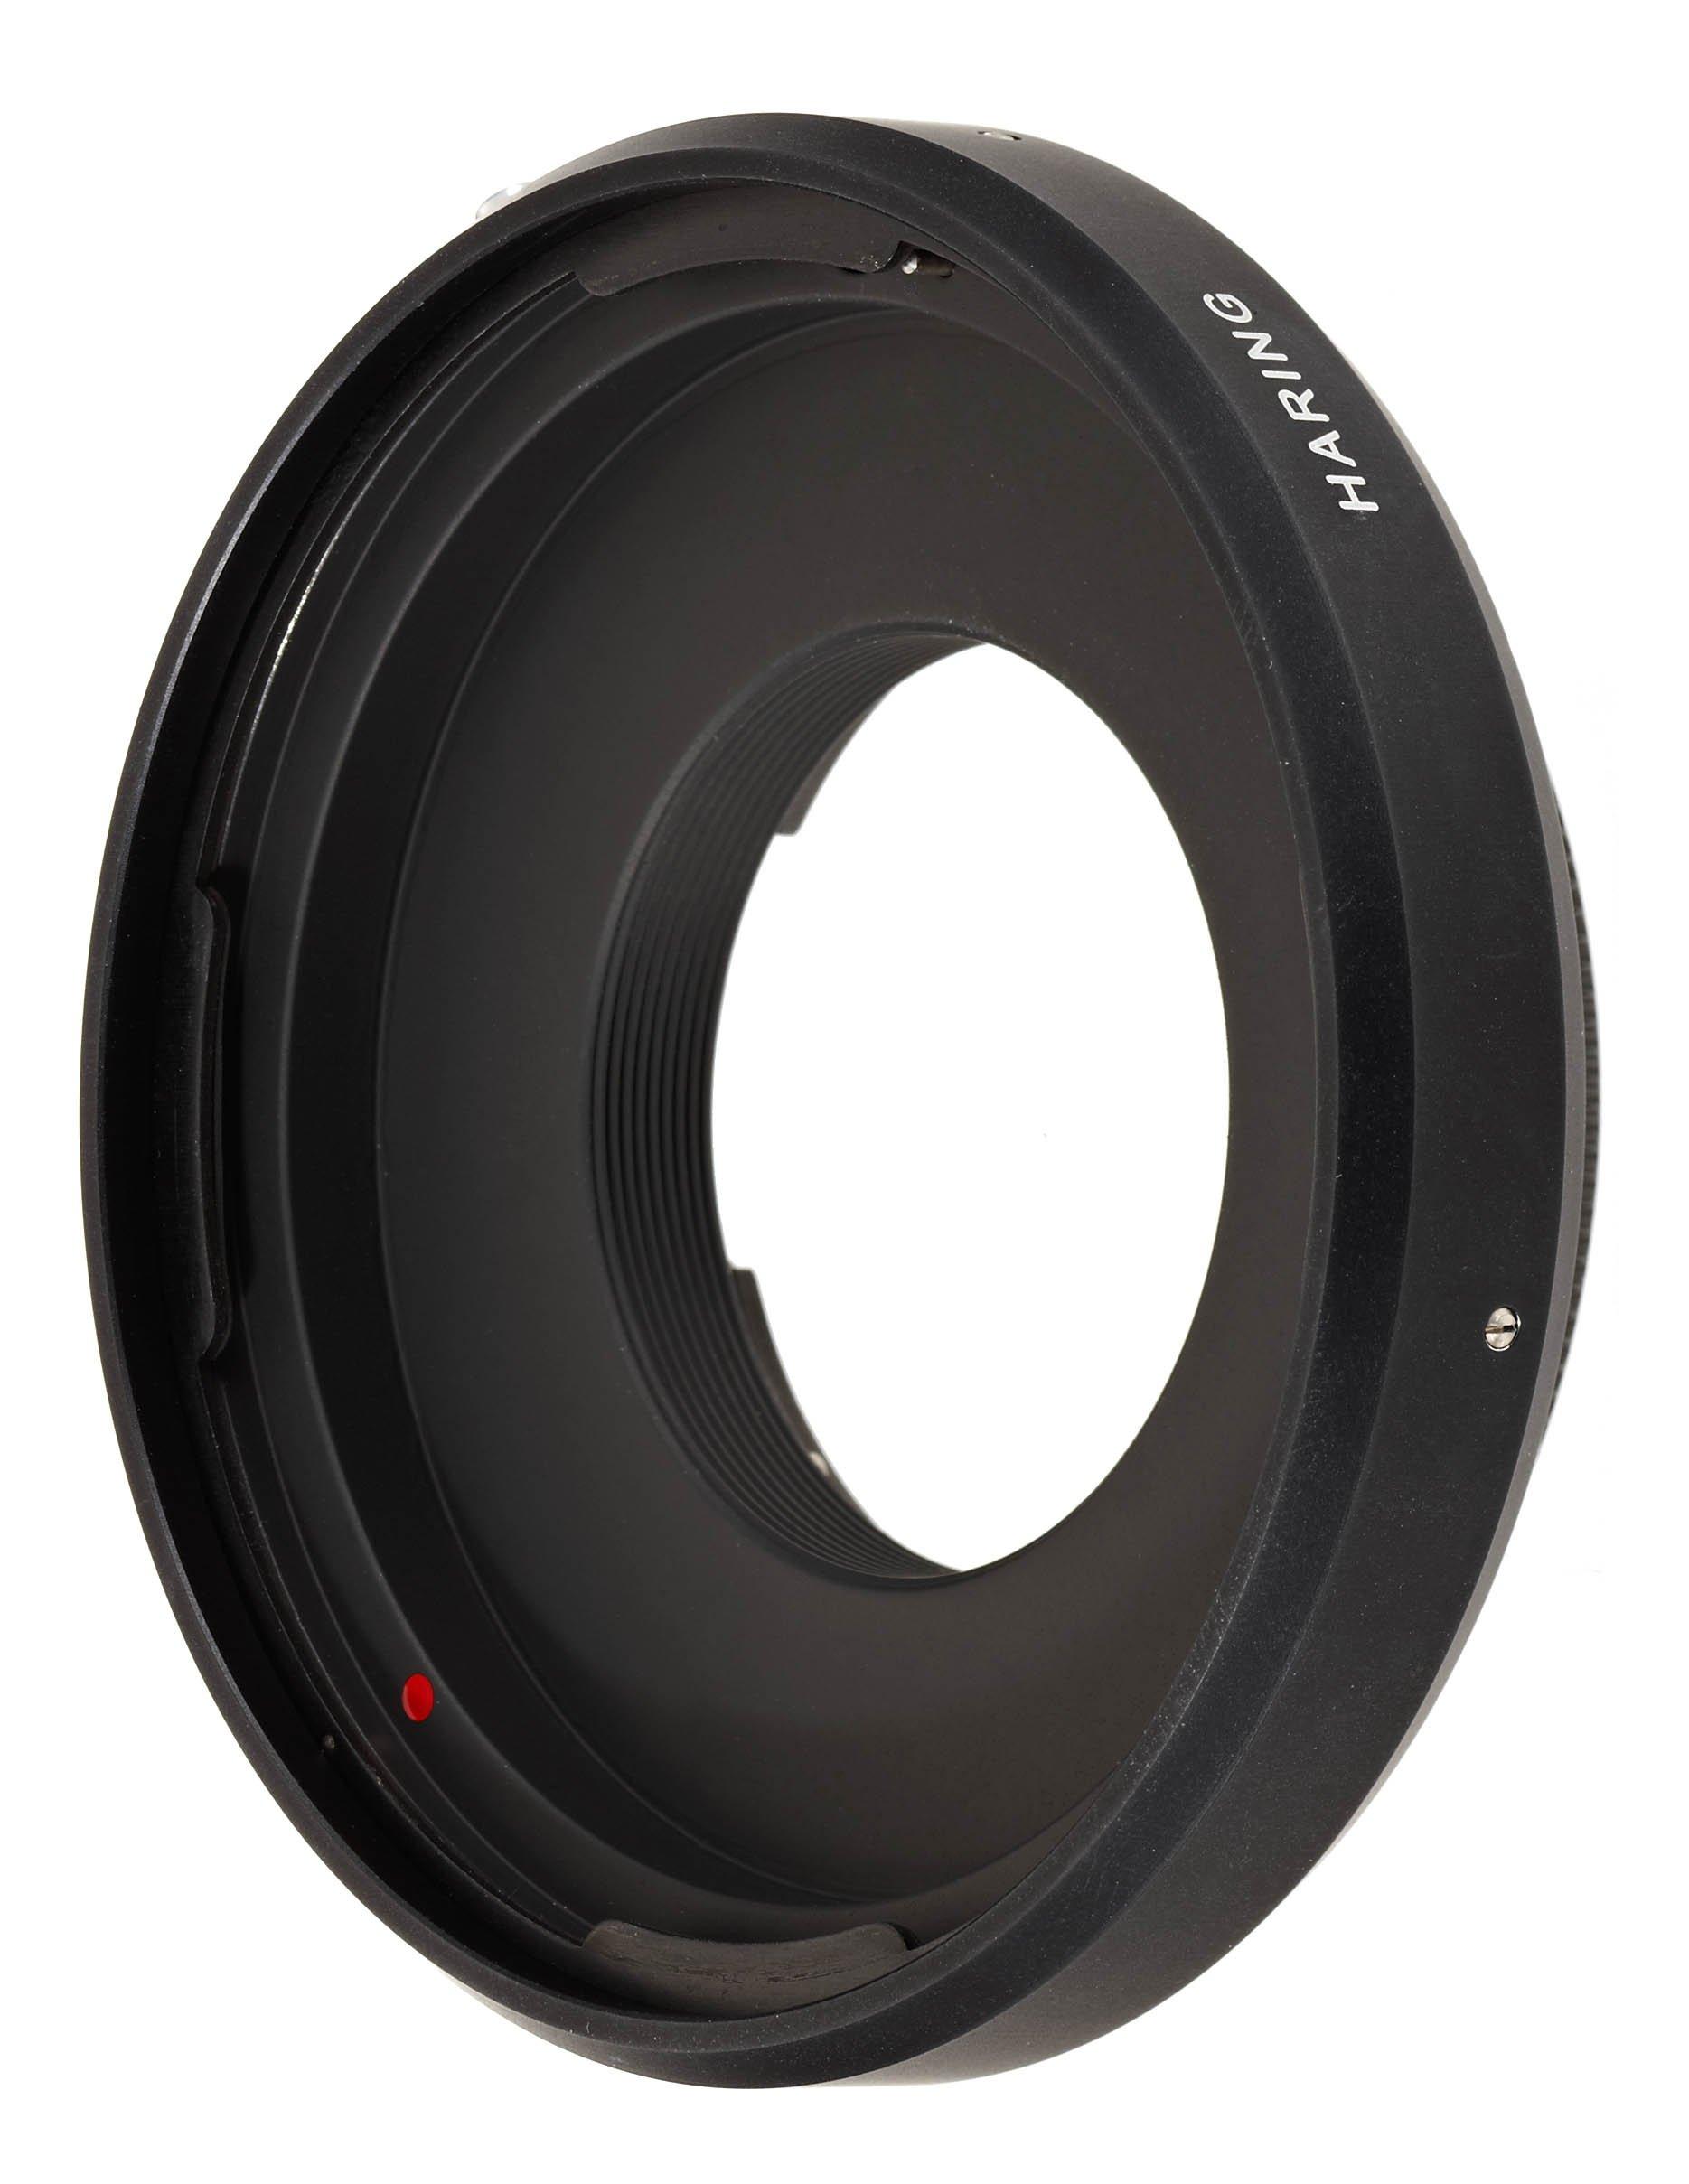 Novoflex Adapter for Hasselblad Lenses to Novoflex A-Mount  (HARING)